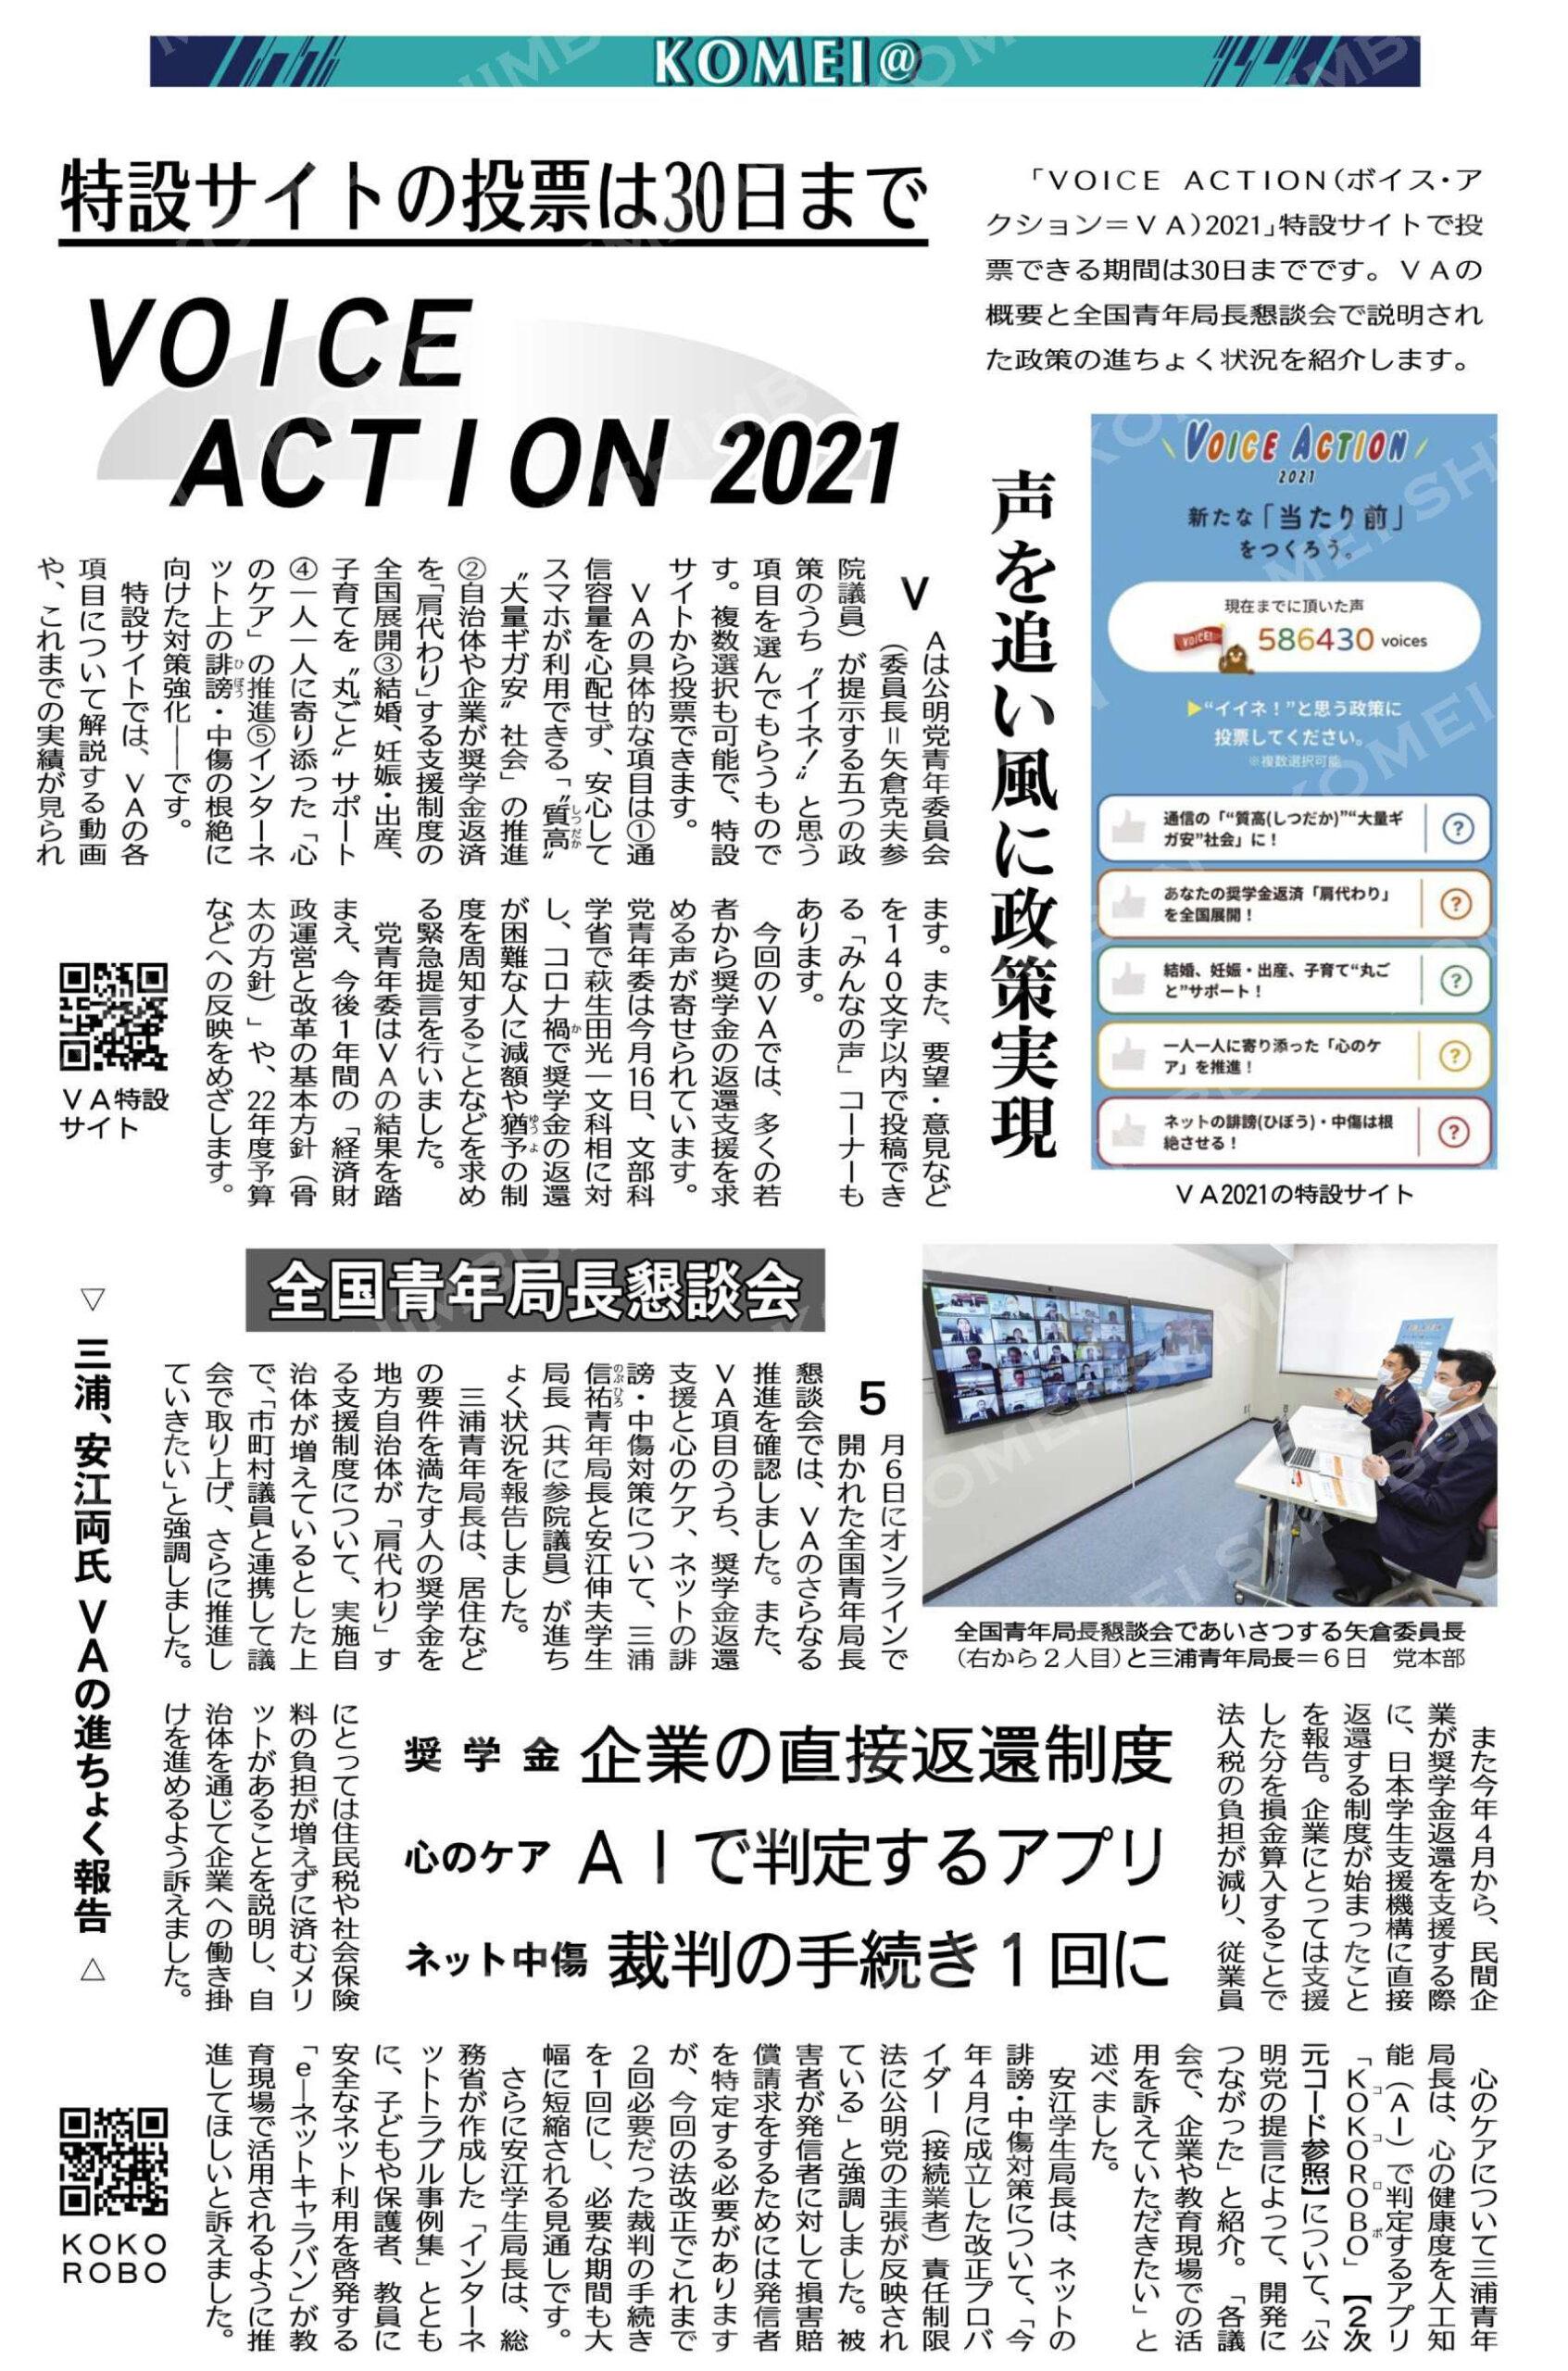 (KOMEI@)VOICE ACTION2021/特設サイトの投票は30日まで